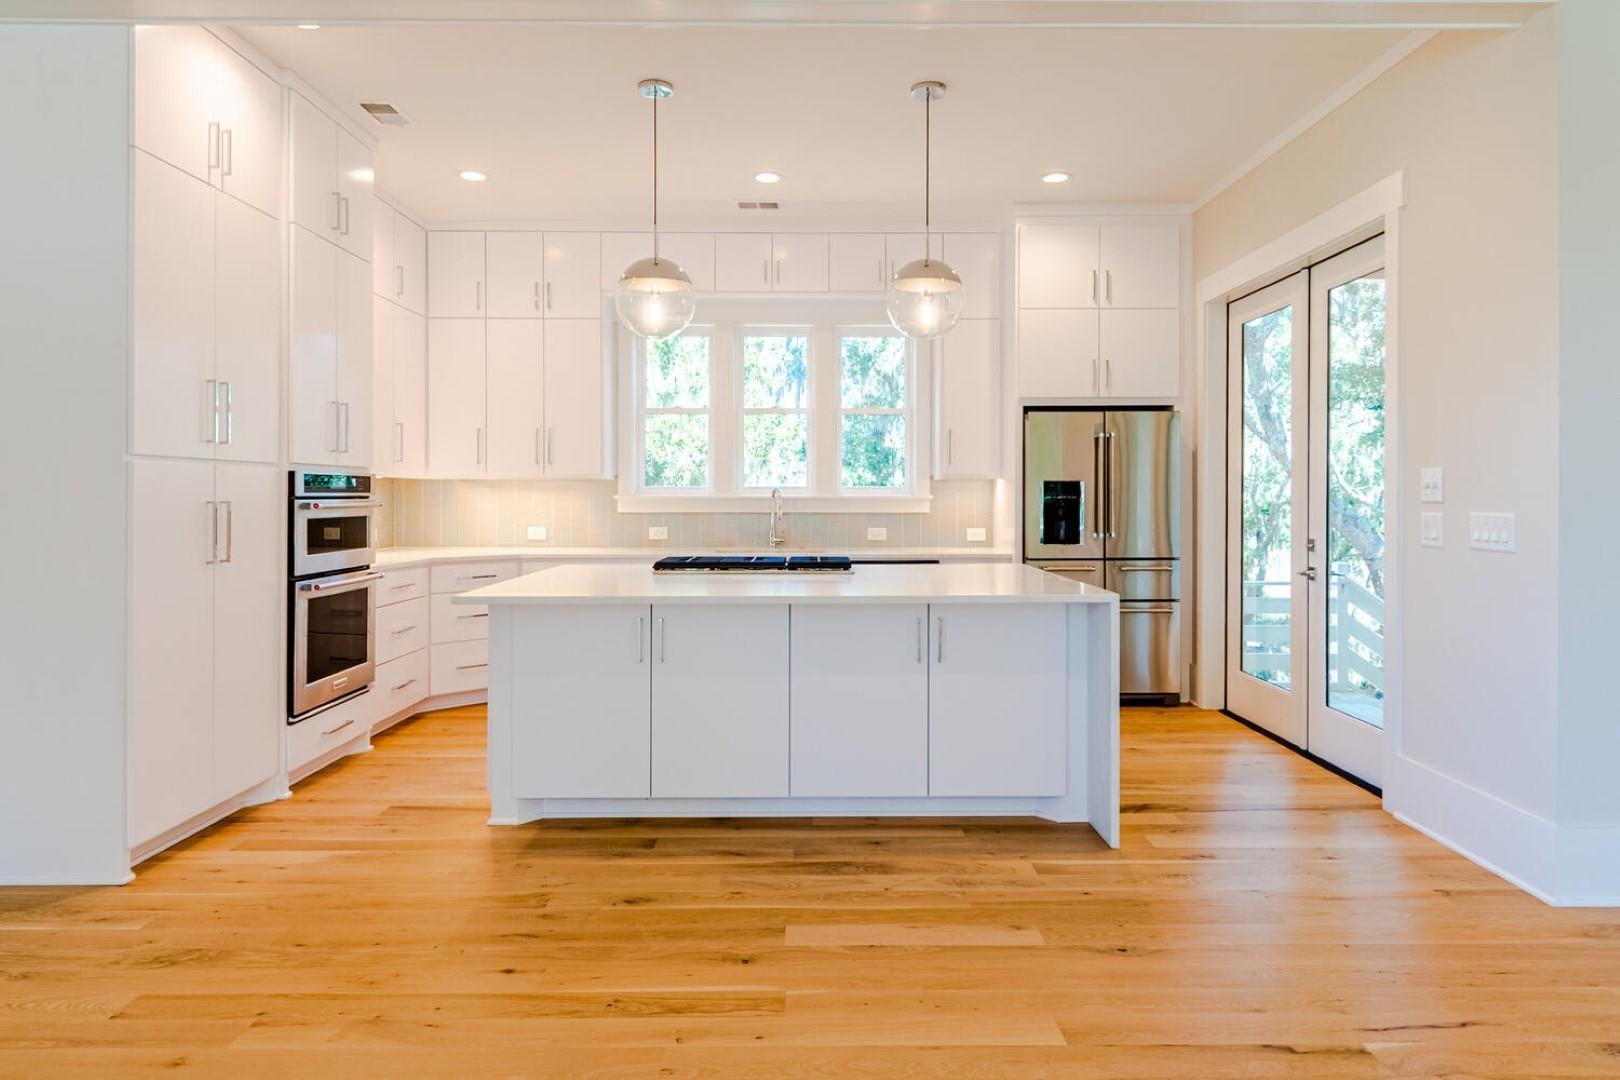 Scanlonville Homes For Sale - 156 5th, Mount Pleasant, SC - 49